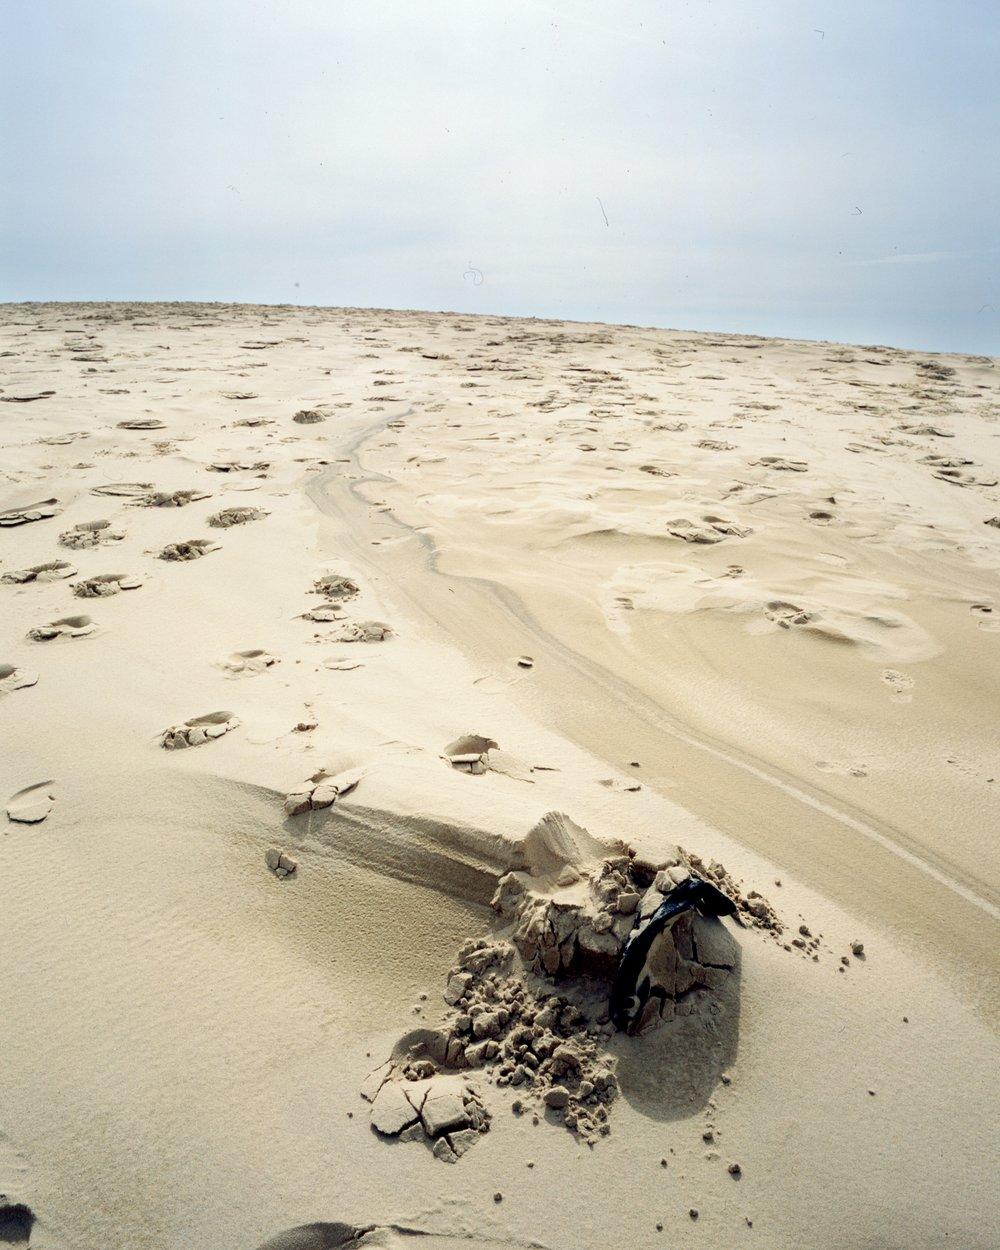 dune du pilat april18 - 010.jpeg